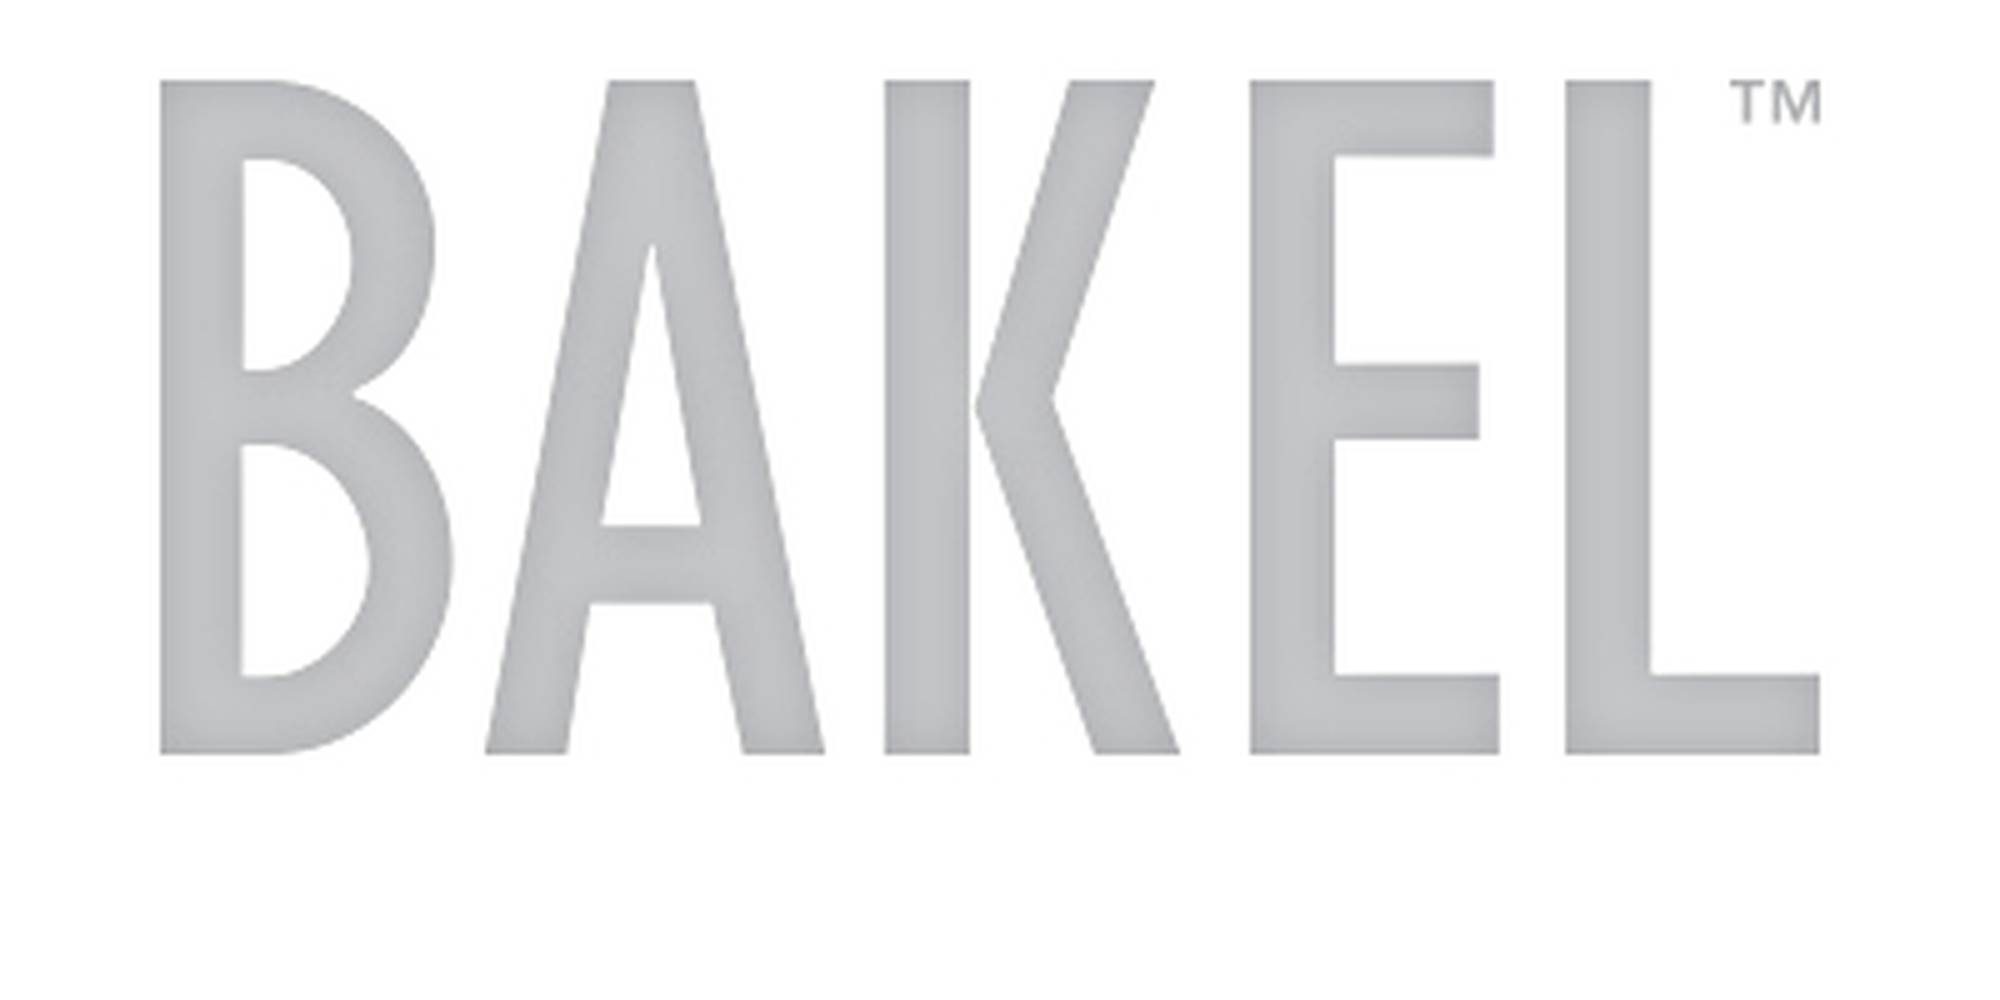 bakel_logo21.jpg